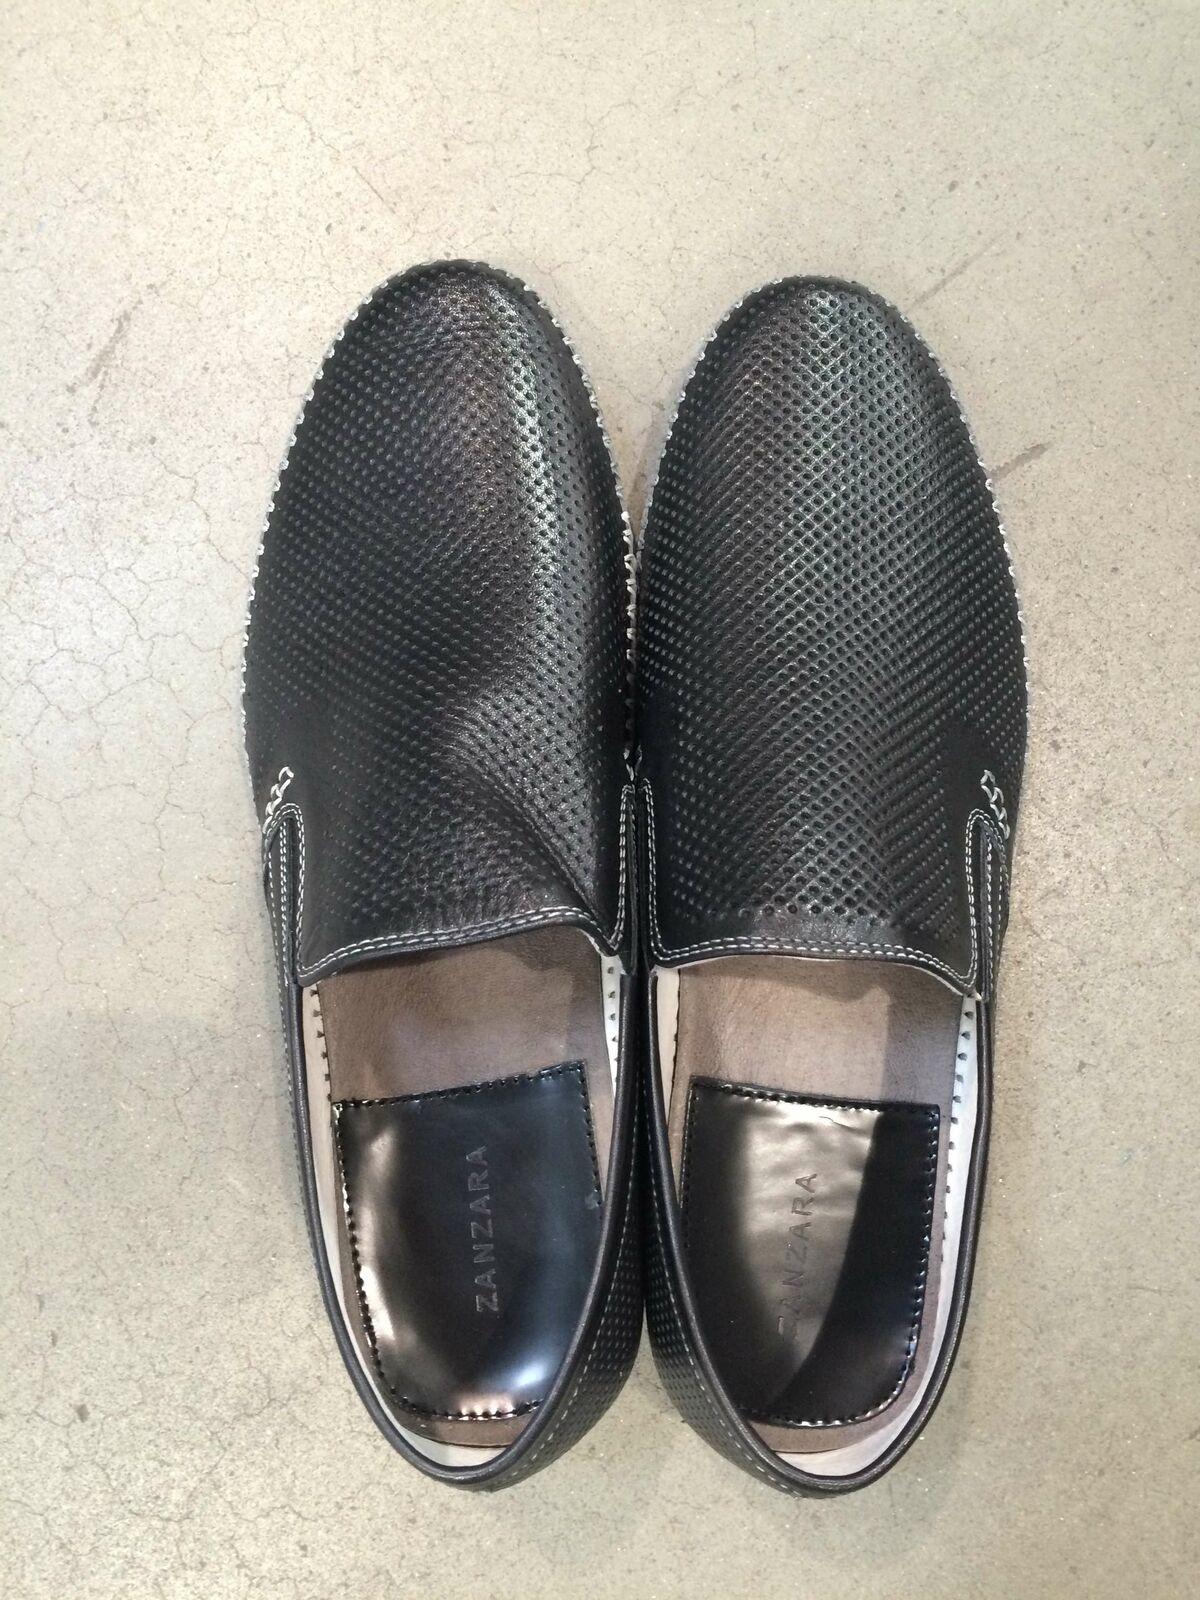 Zanzara Men's Leather Slip on shoes